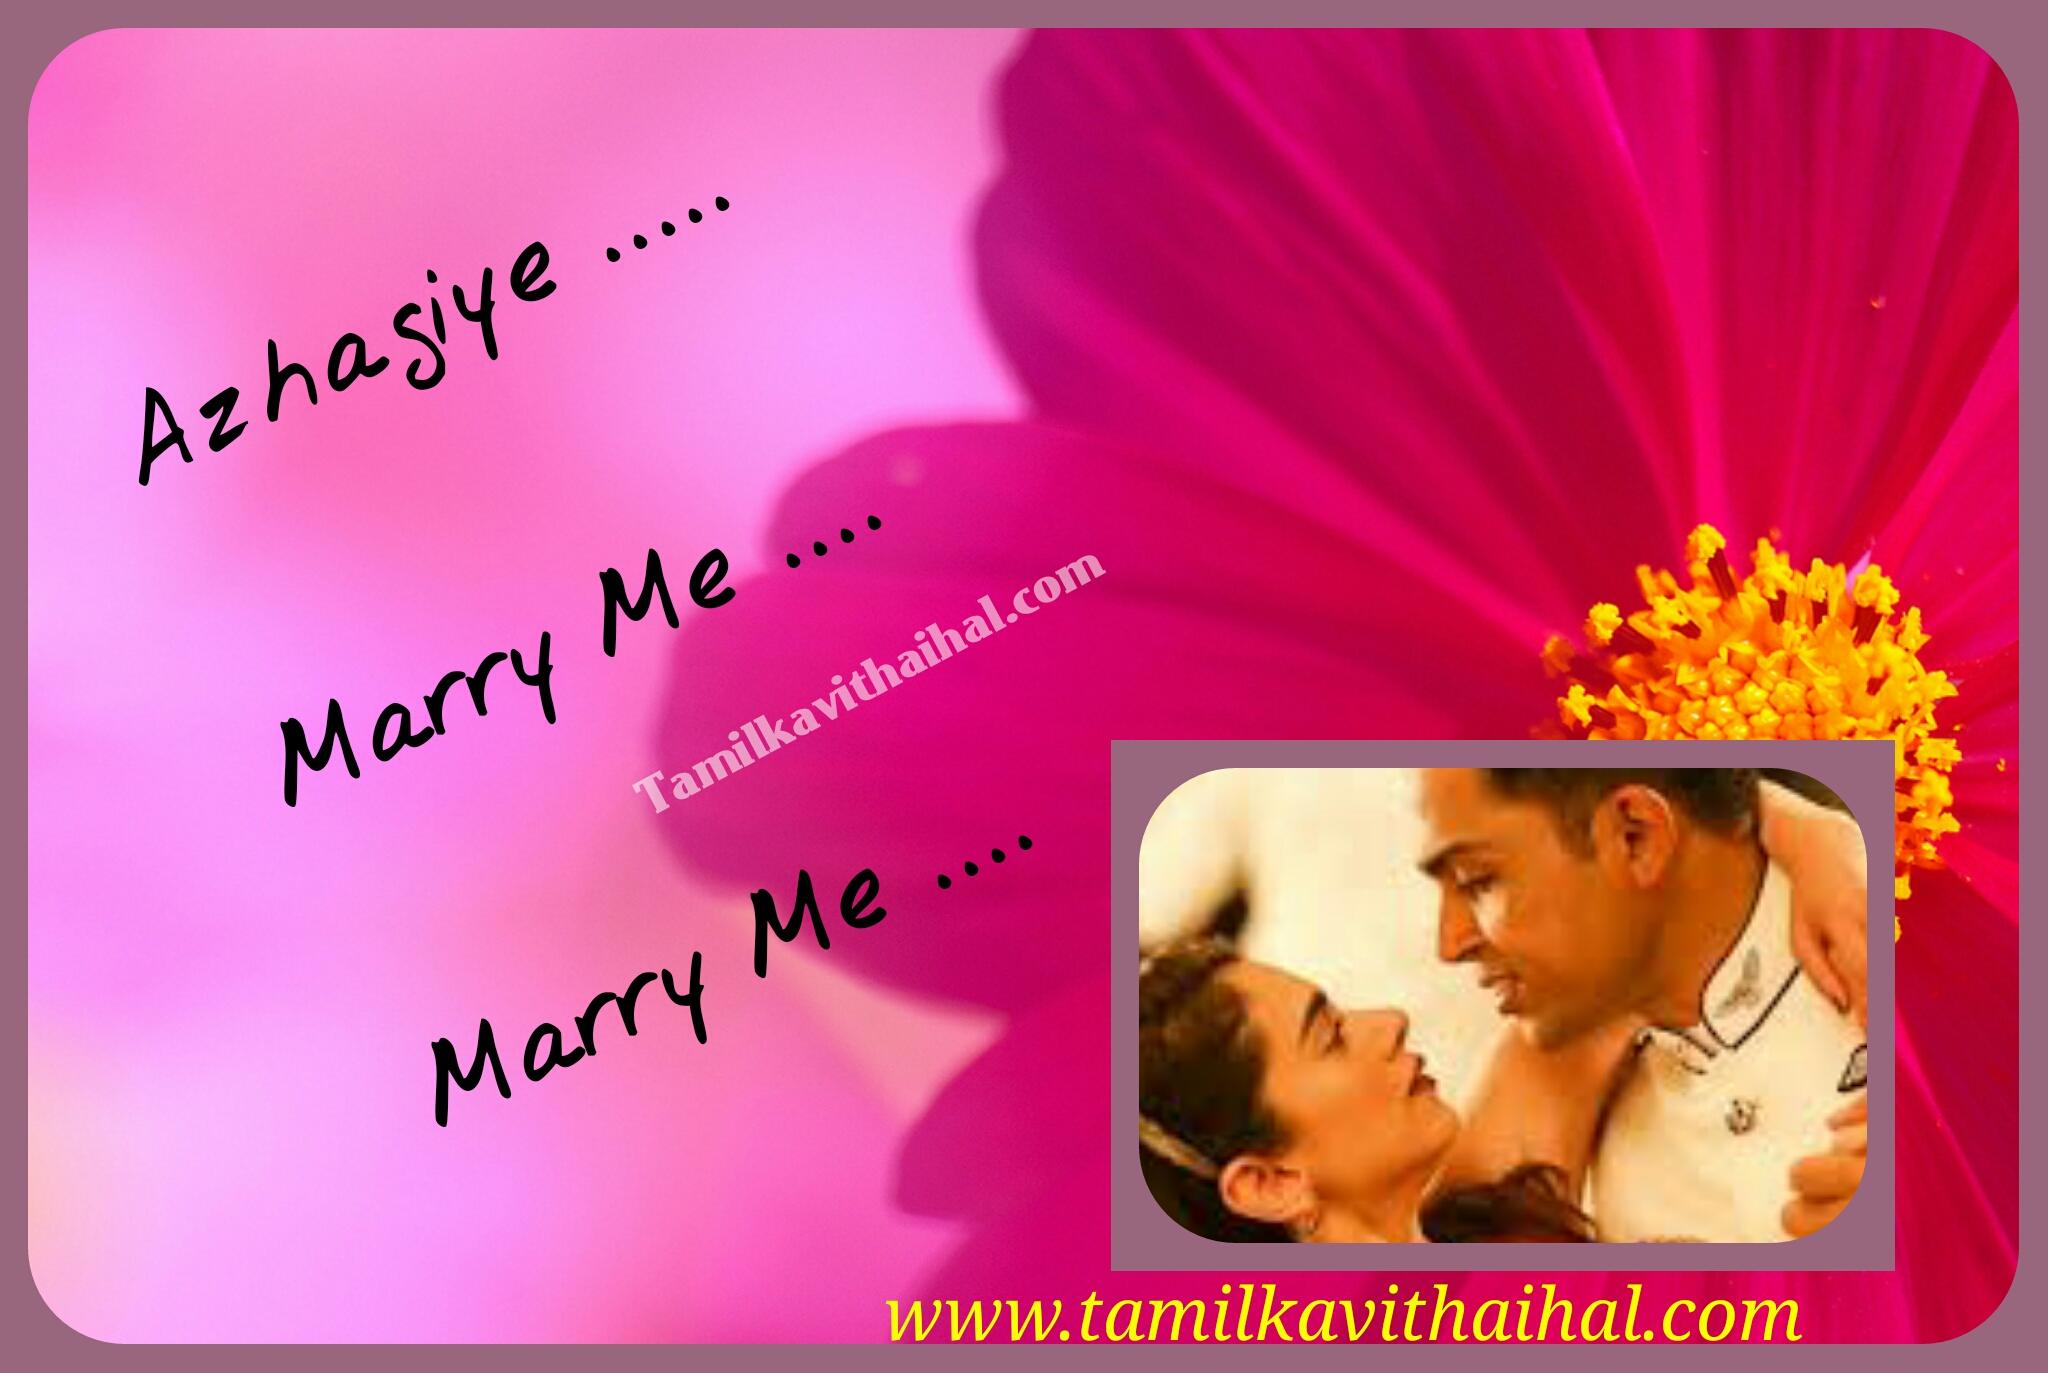 Best love song lyrics quotes download whatsapp dp image